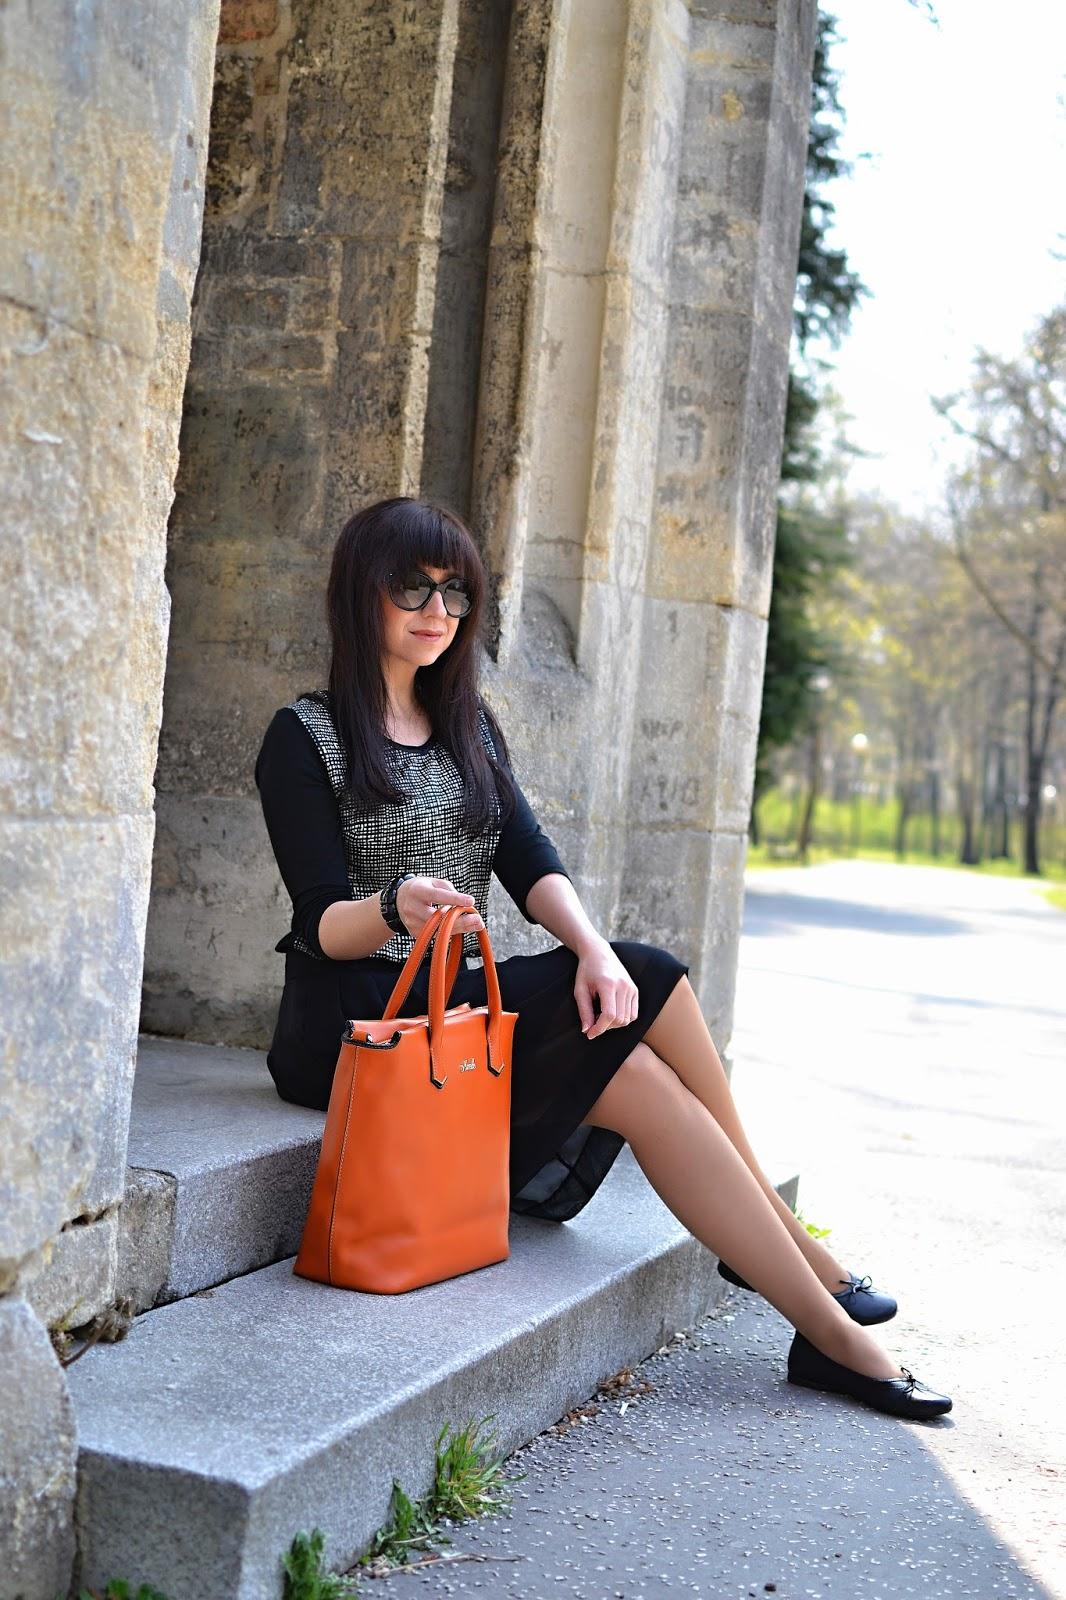 OKORENENÁ KLASIKA_Katharine-fashion is beautiful_Čierna šifónová sukňa_Oranžová maxi kabelka_Katarína Jakubčová_Fashion blogger